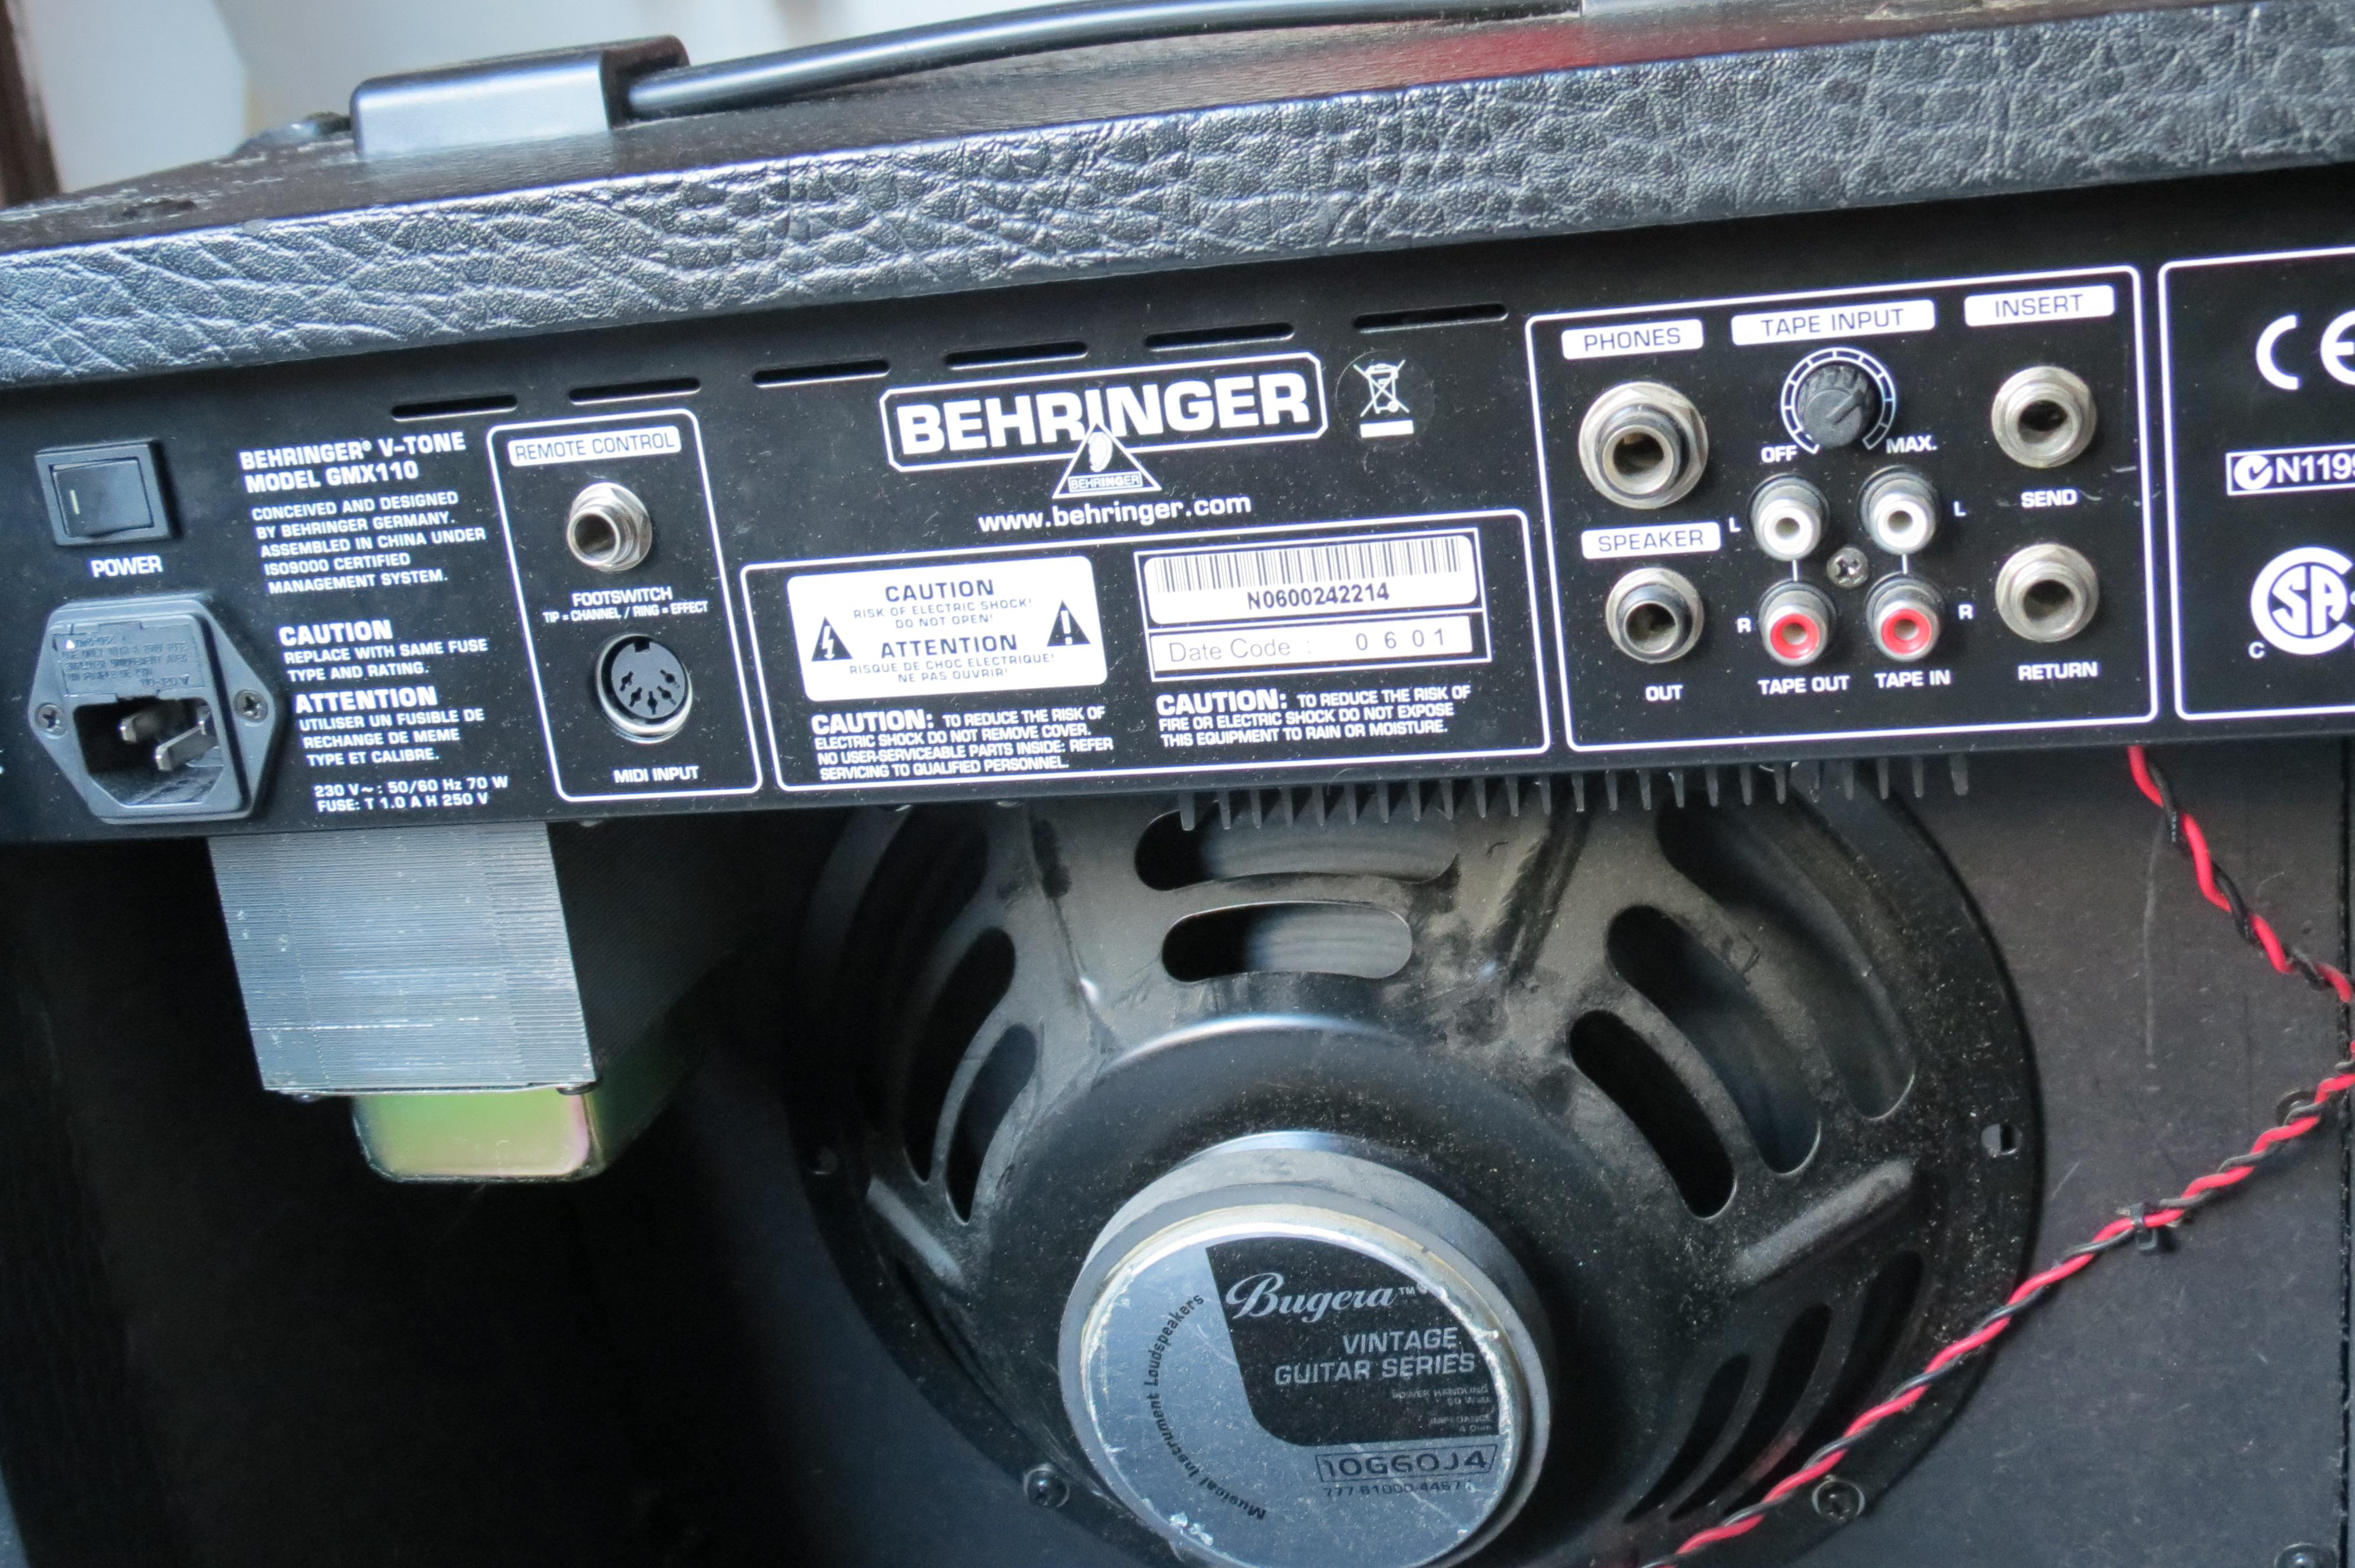 Behringer V Tone Gmx110 Image 822733 Audiofanzine